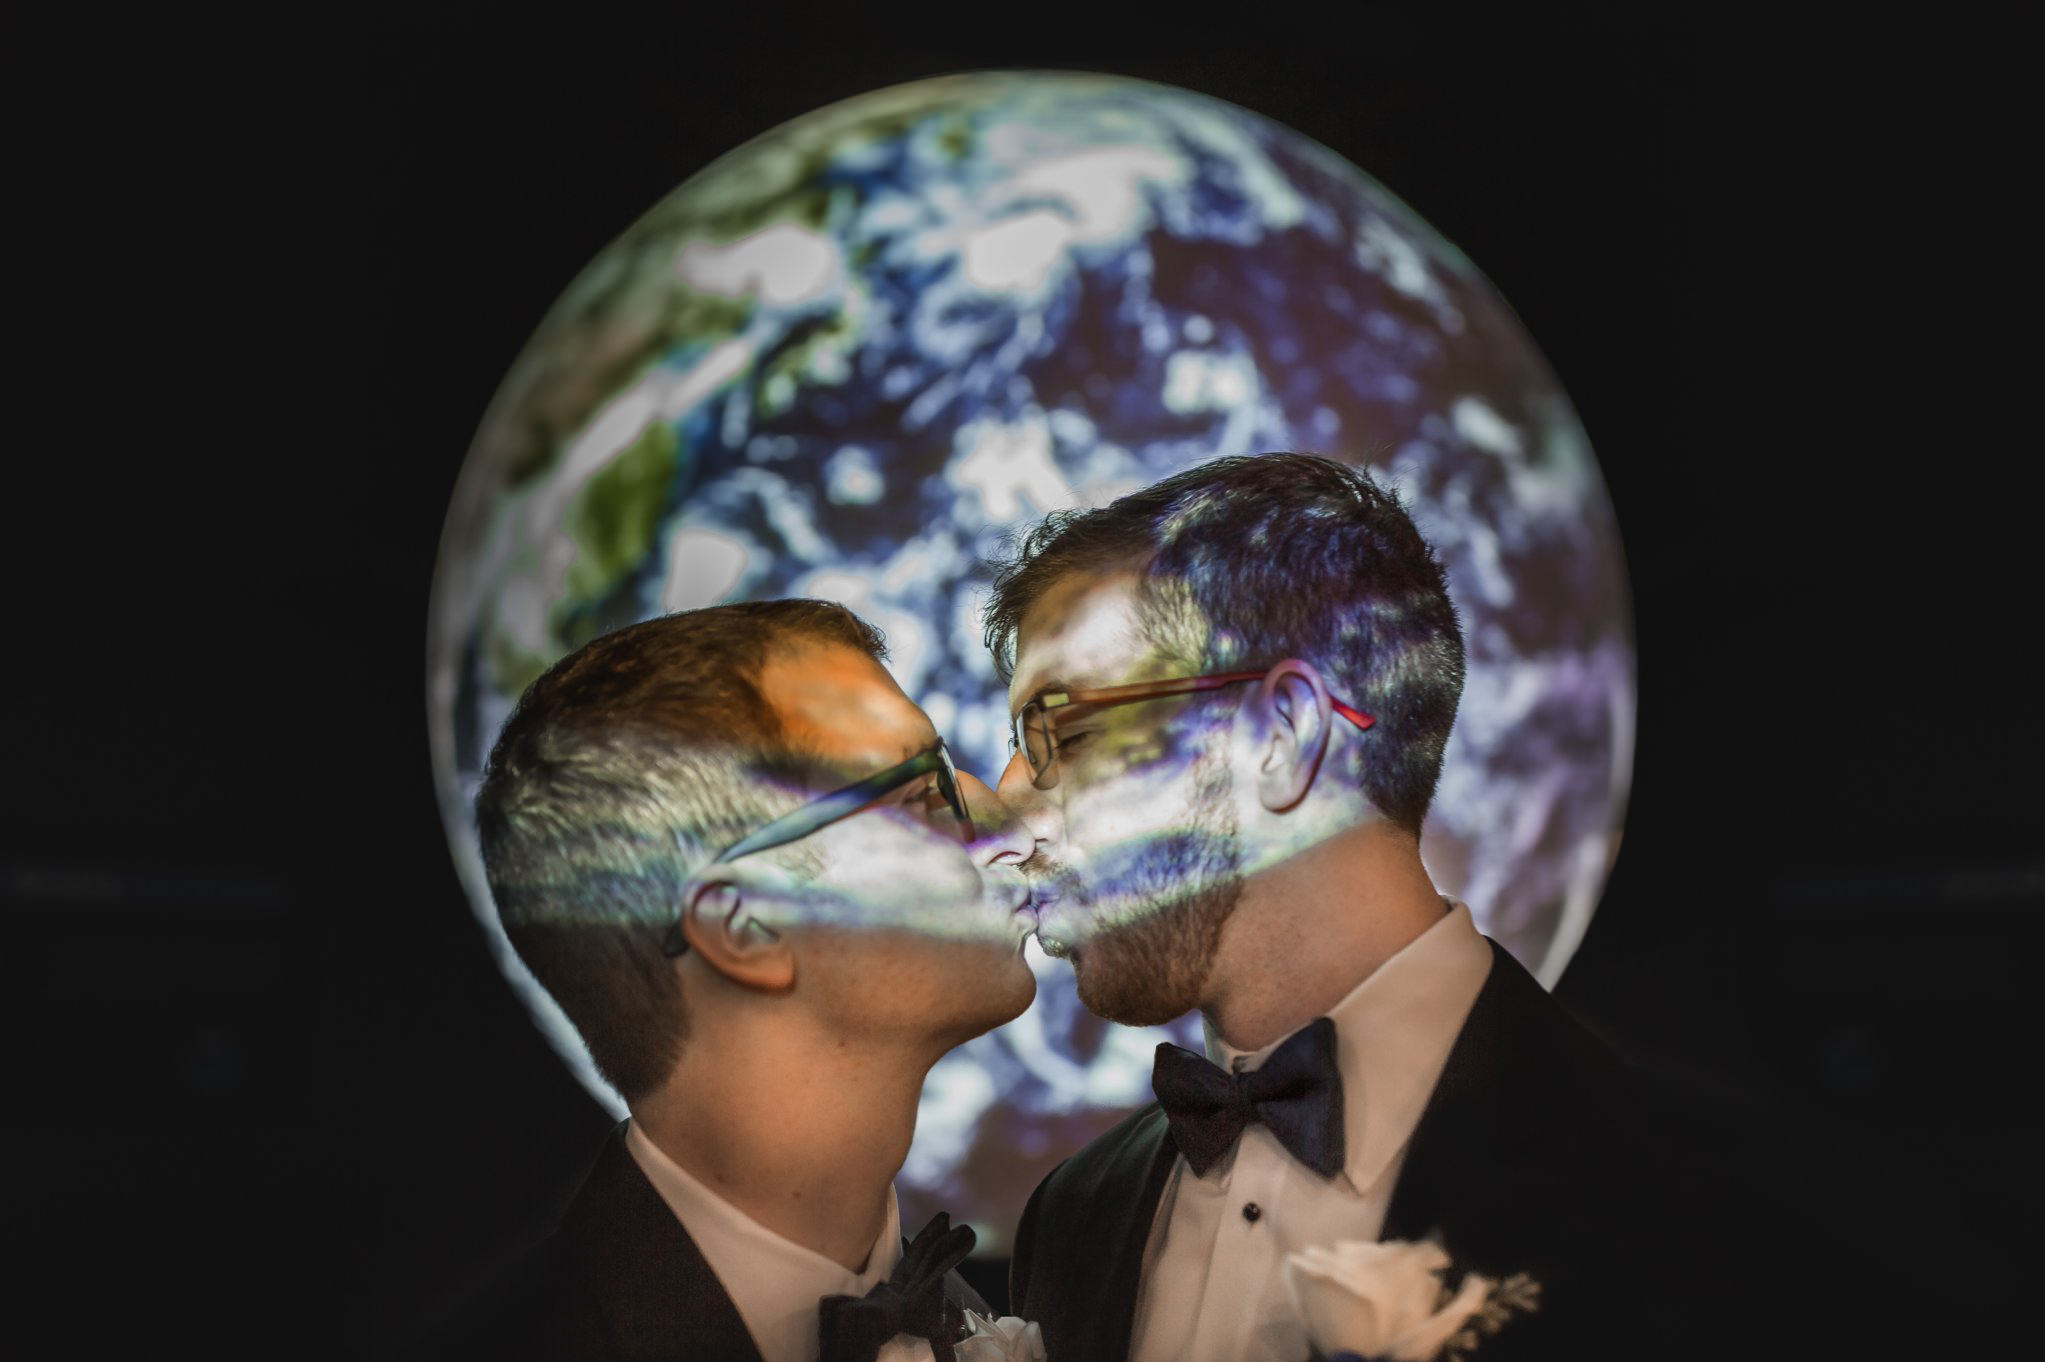 Rollins Chapel + Orlando Science Center Gay LGBT Dinosaur Themed Wedding Adam + Craig 47.jpg